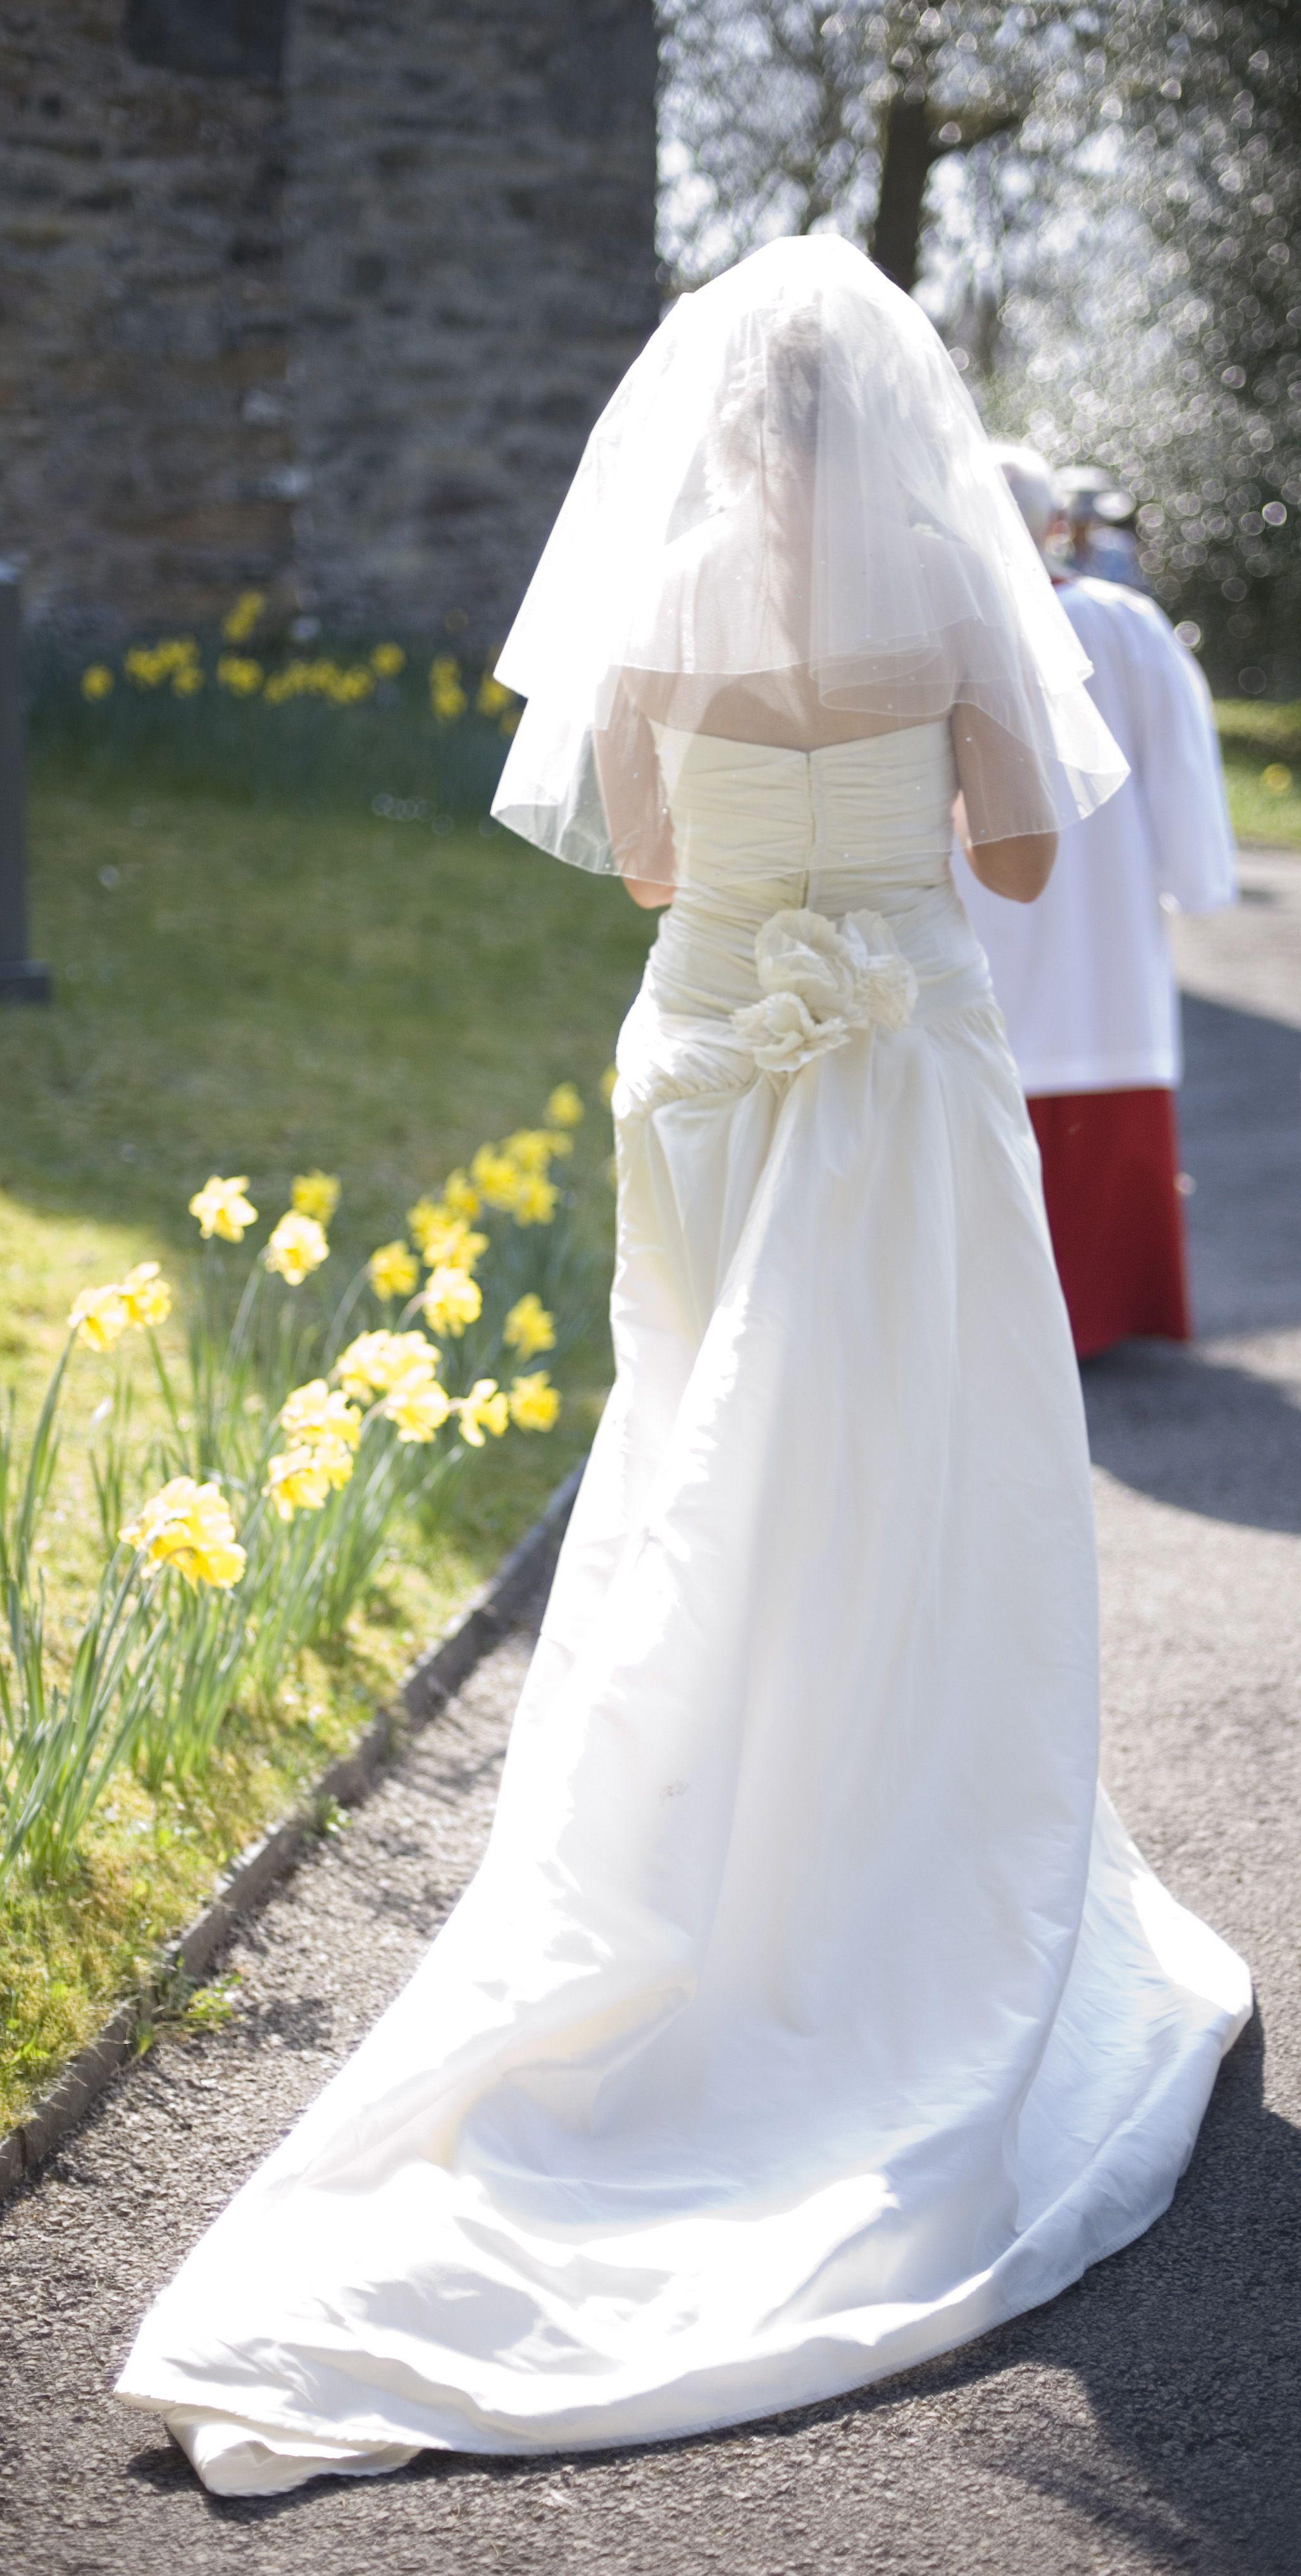 bride_and_veil.jpg 2,056×4,072 pixels